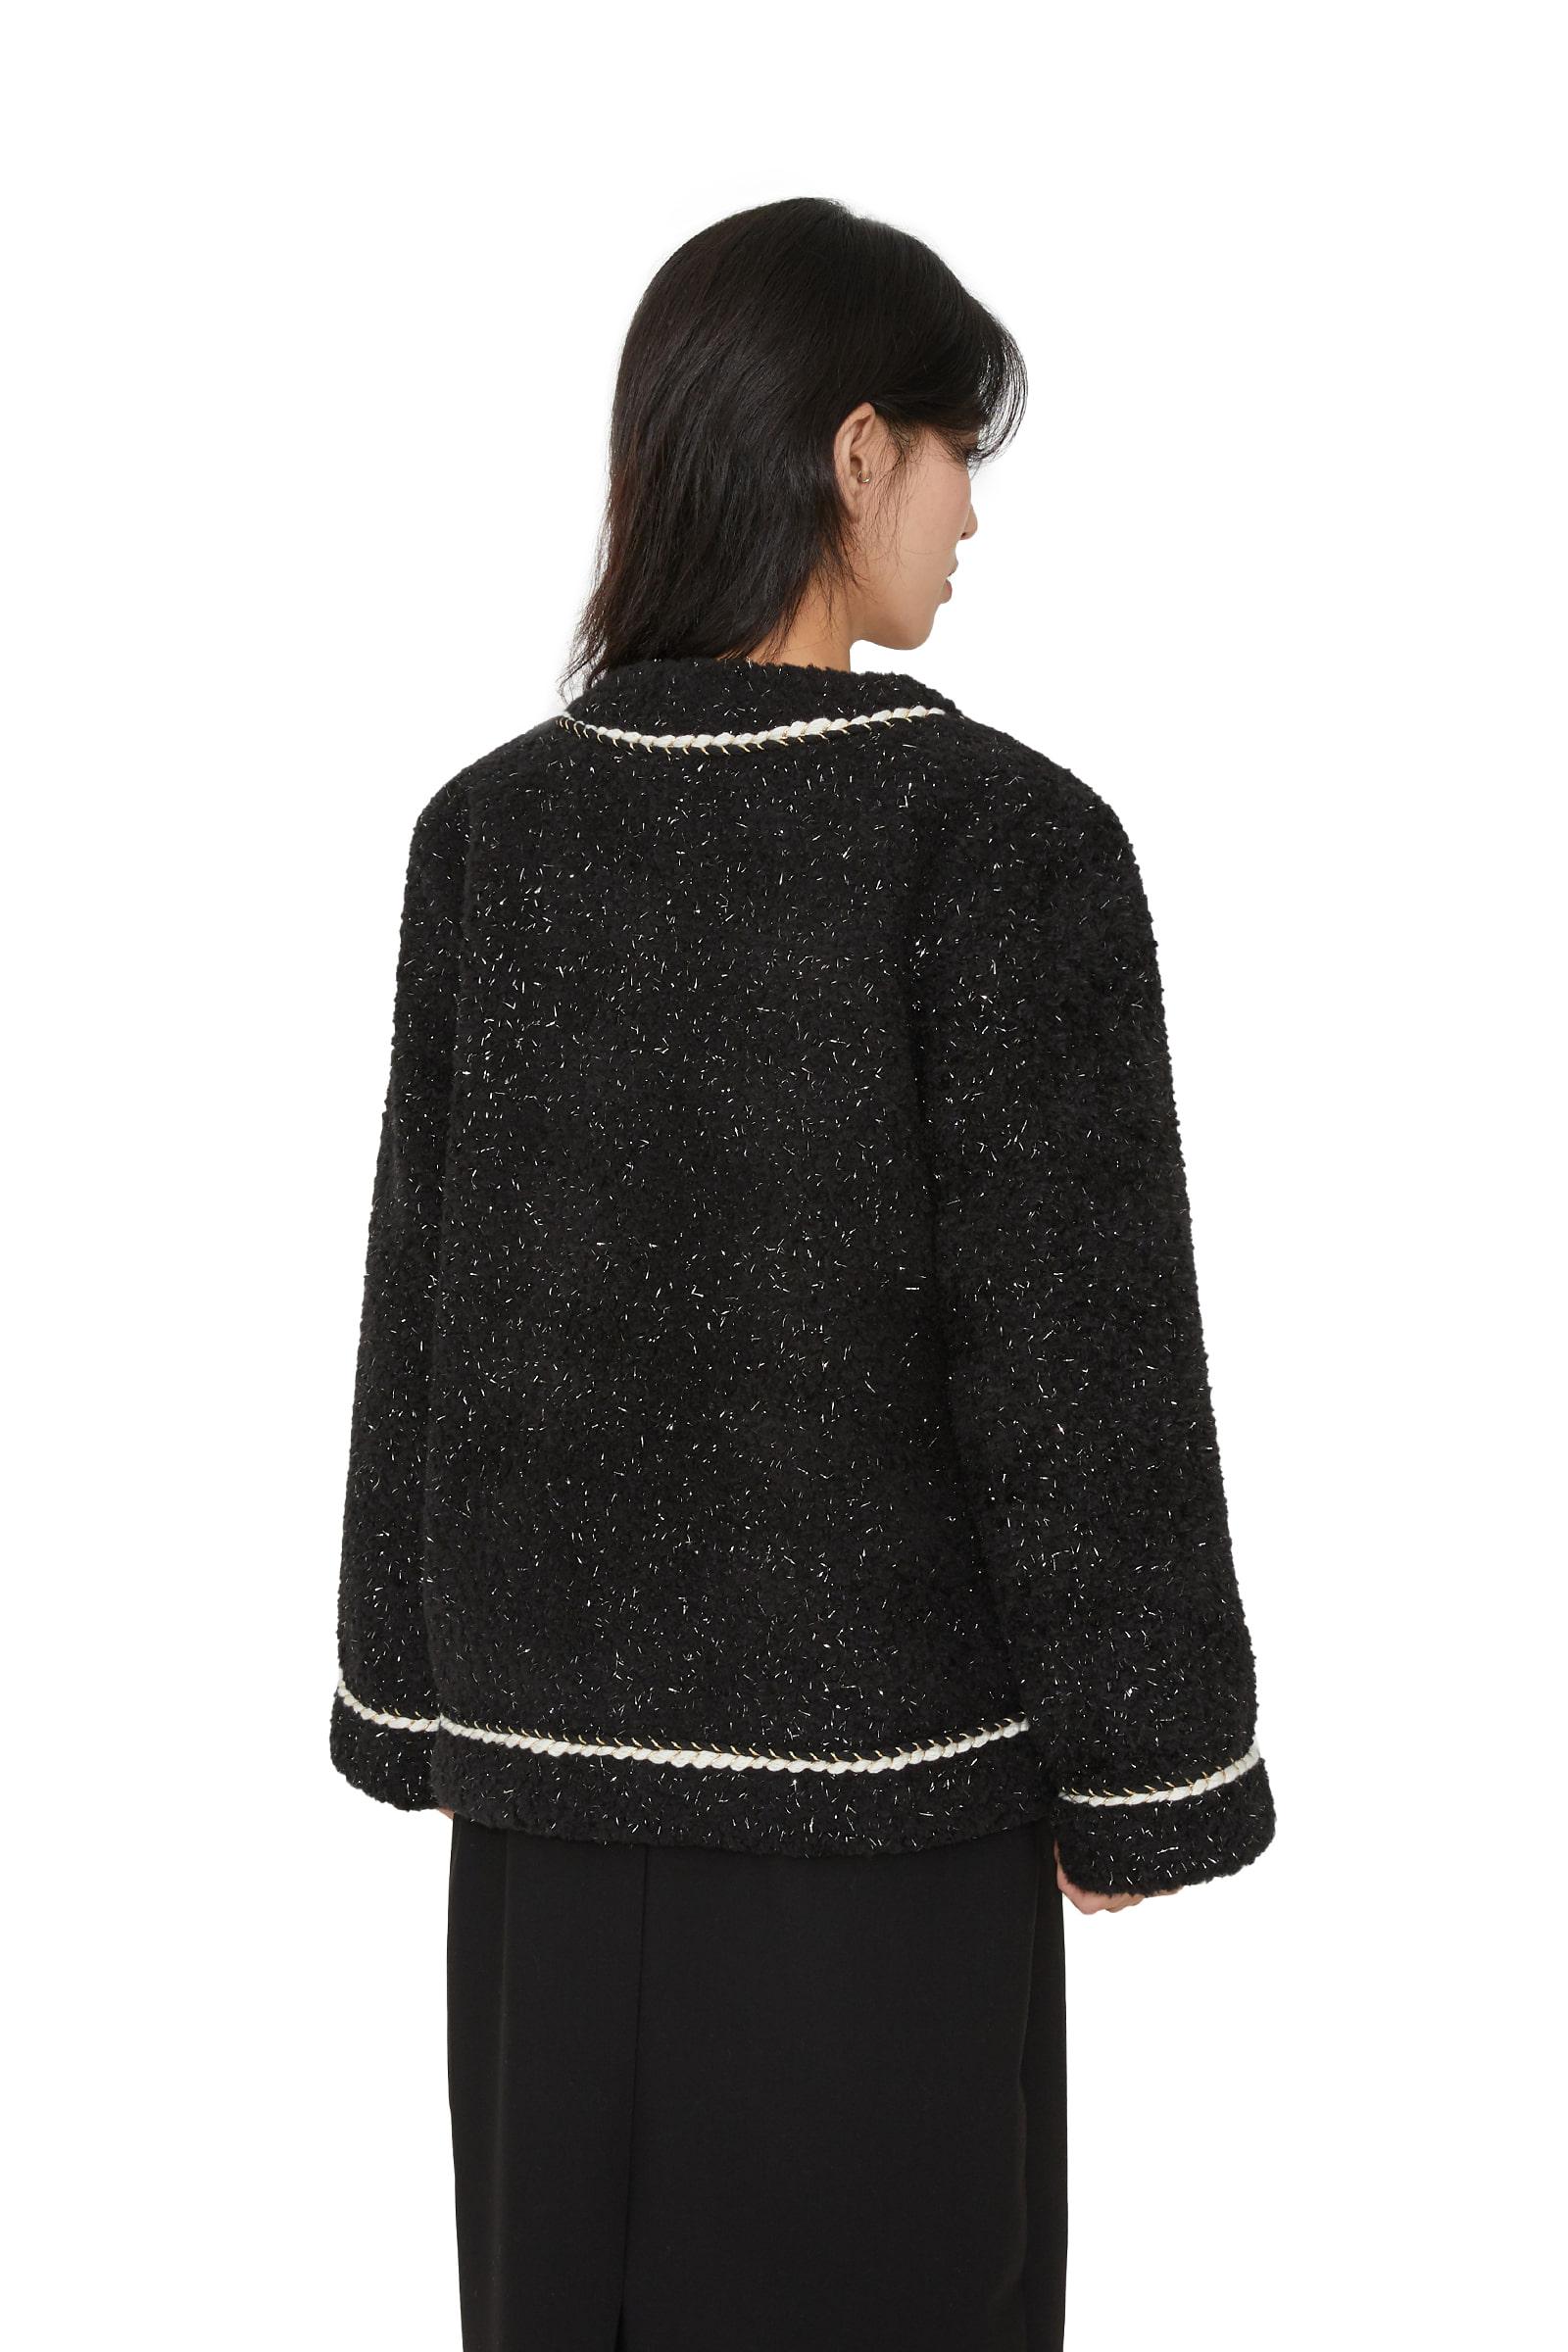 Cashew tweed jacket